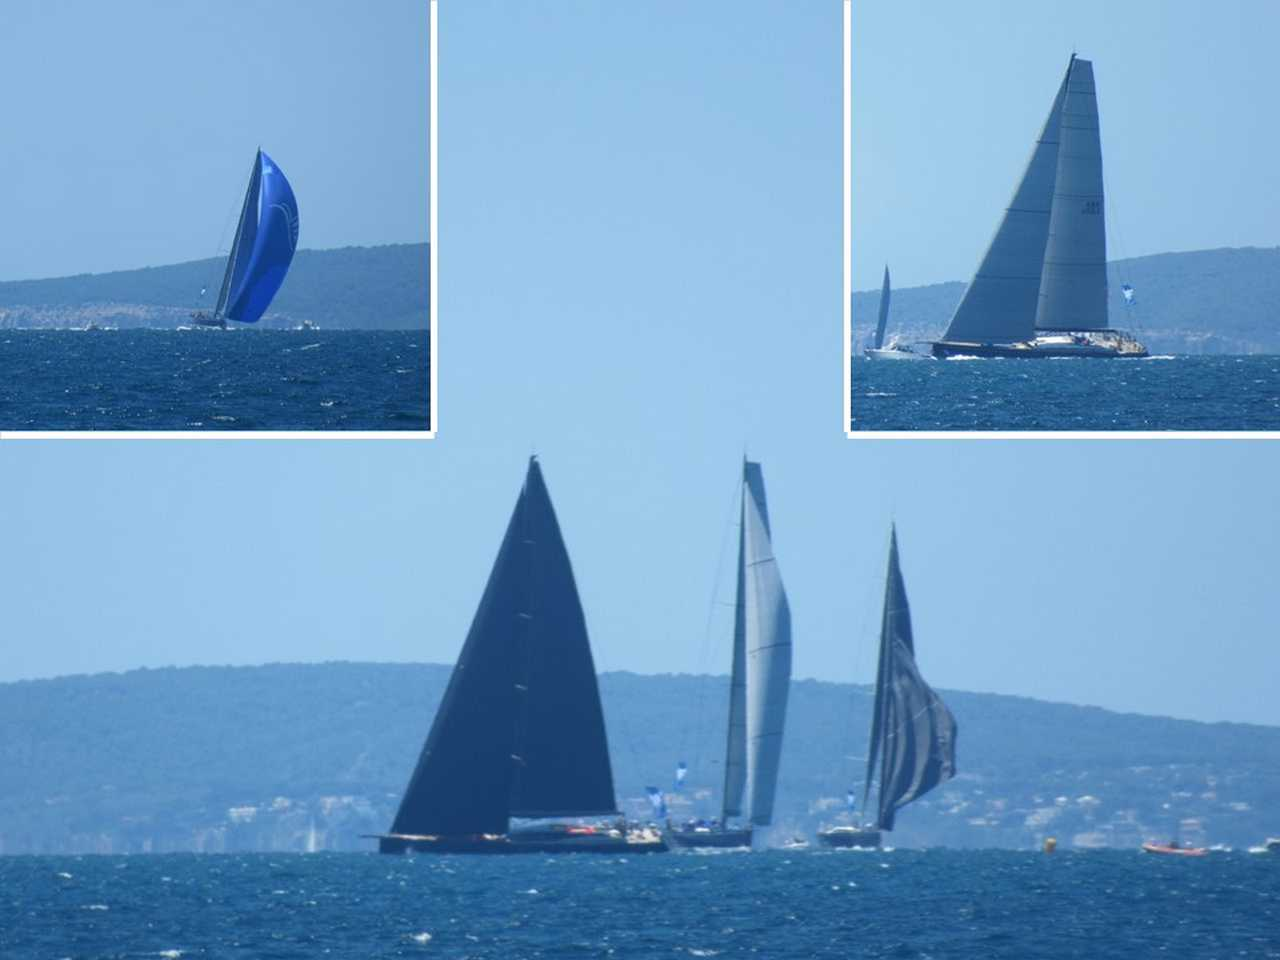 The super yachts entertain.